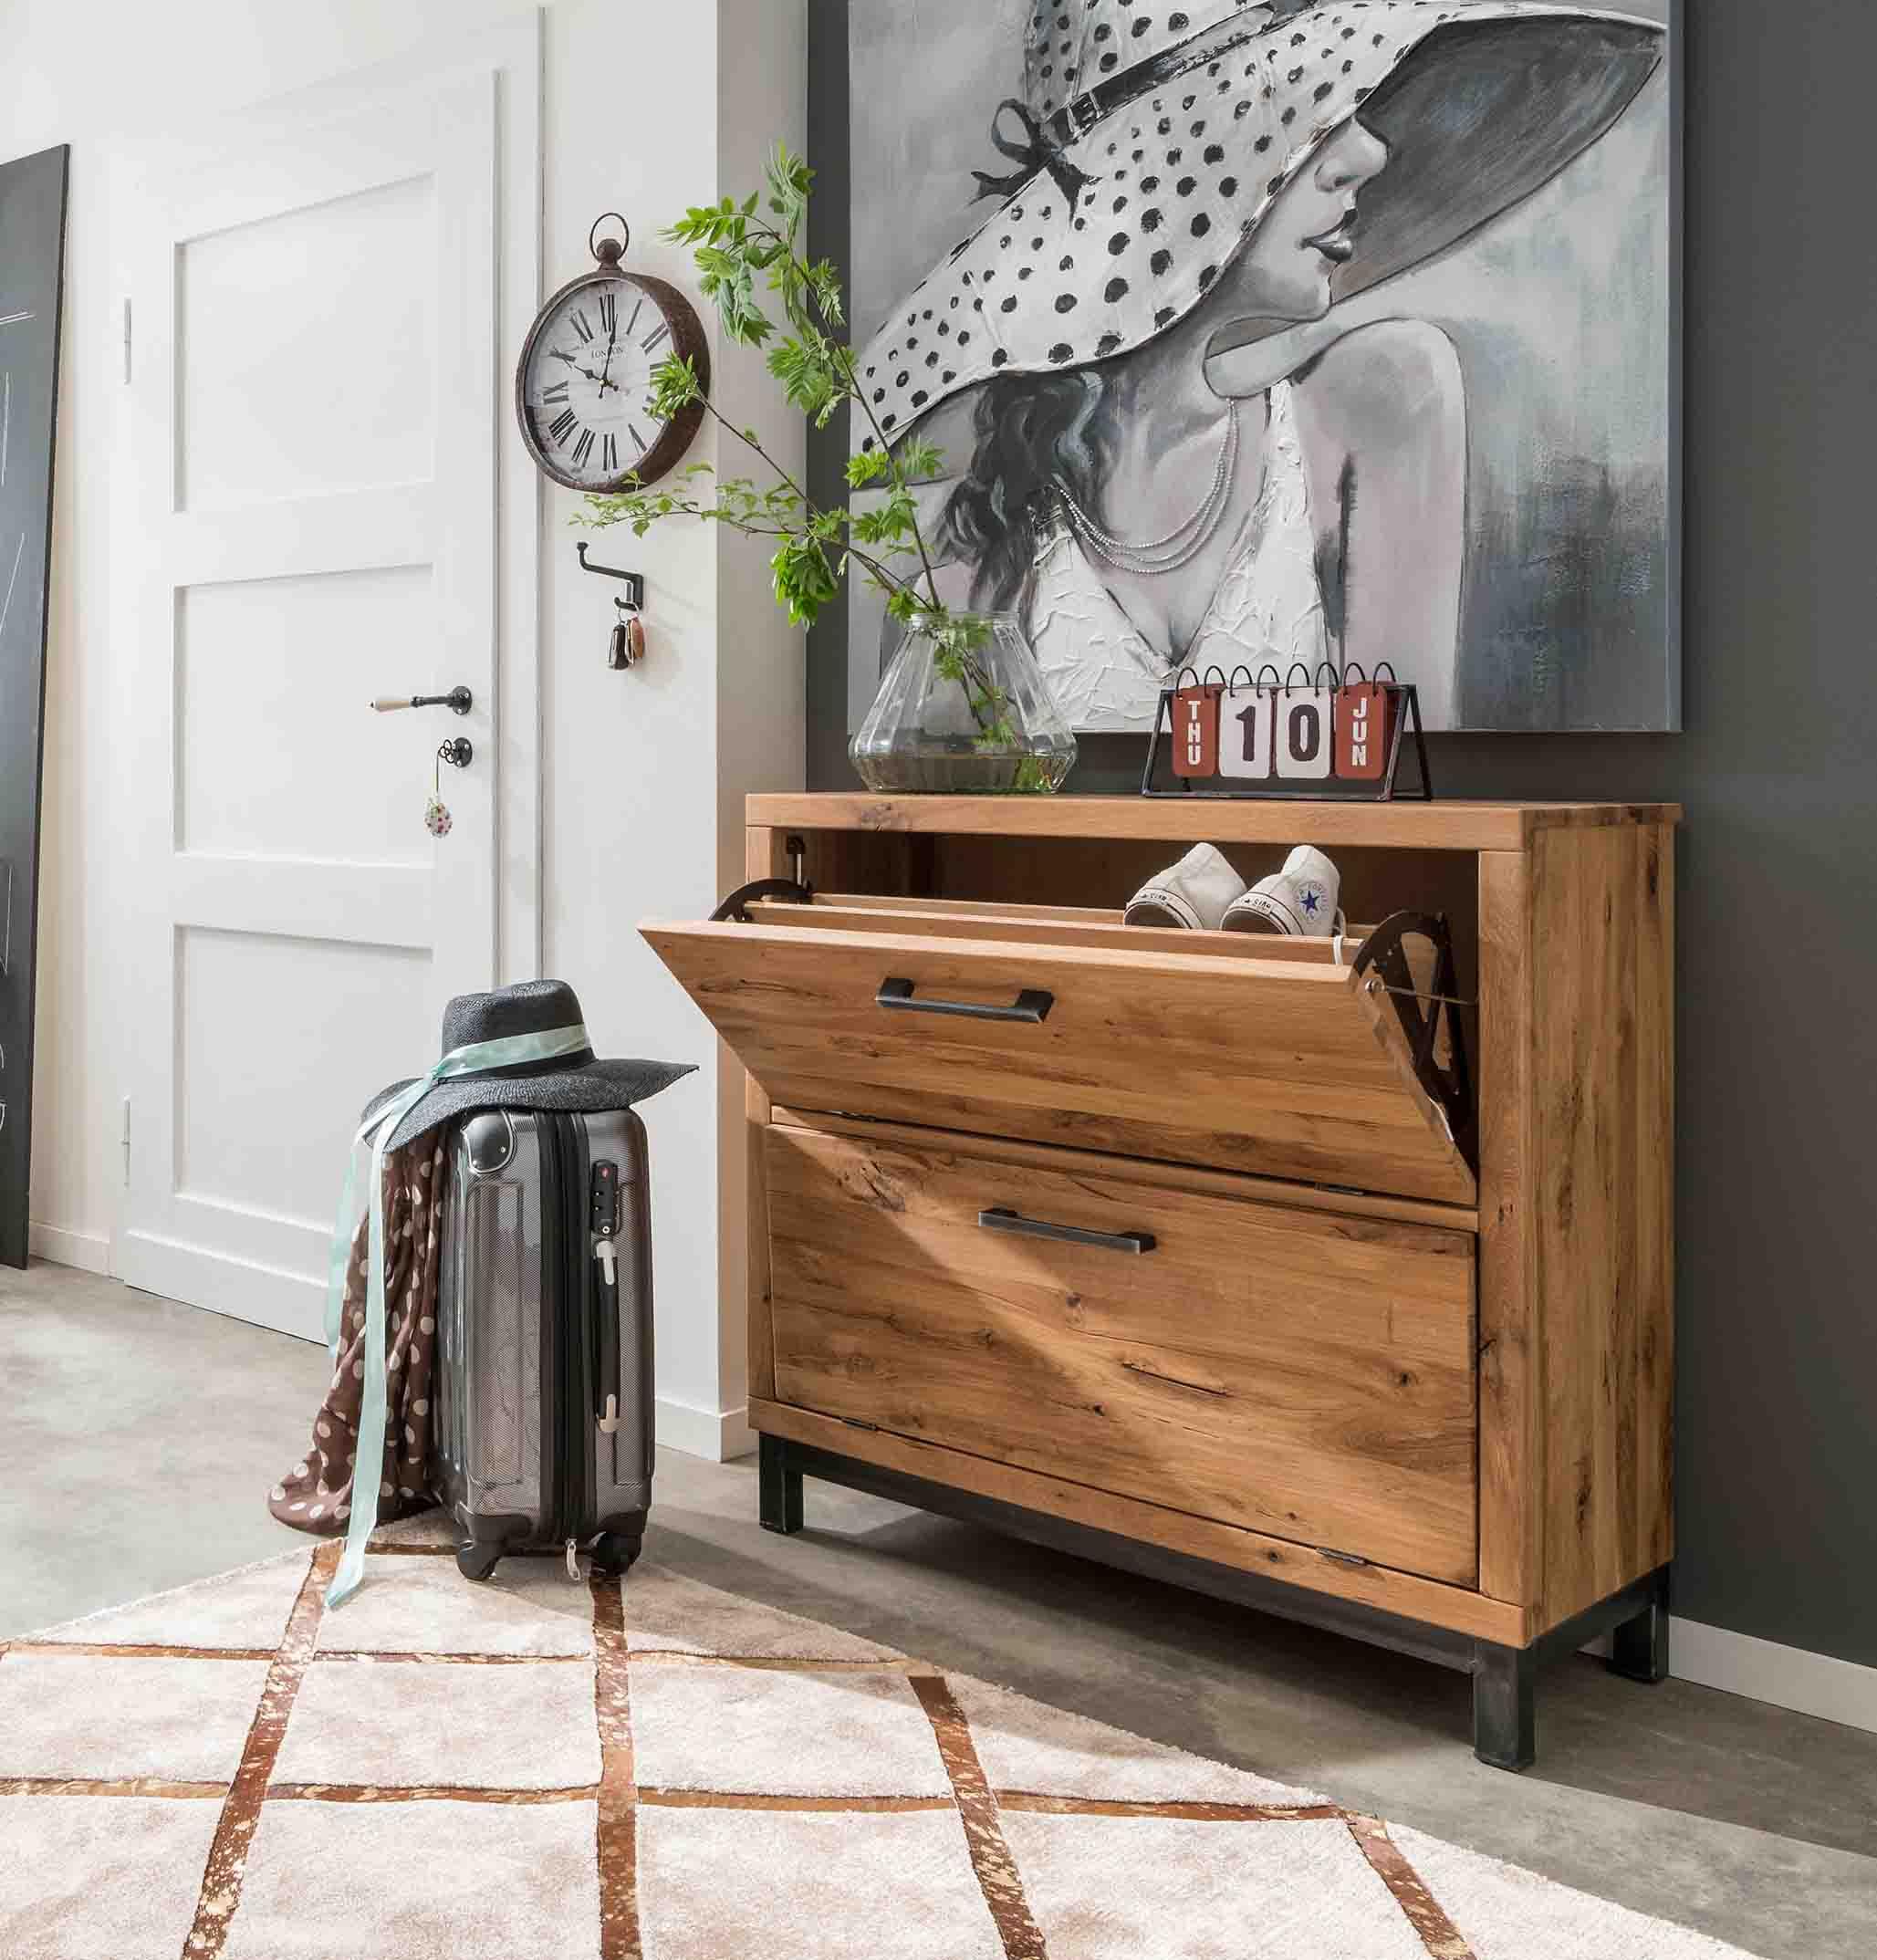 schuhschr nke angebote g nstig online kaufen massiva. Black Bedroom Furniture Sets. Home Design Ideas